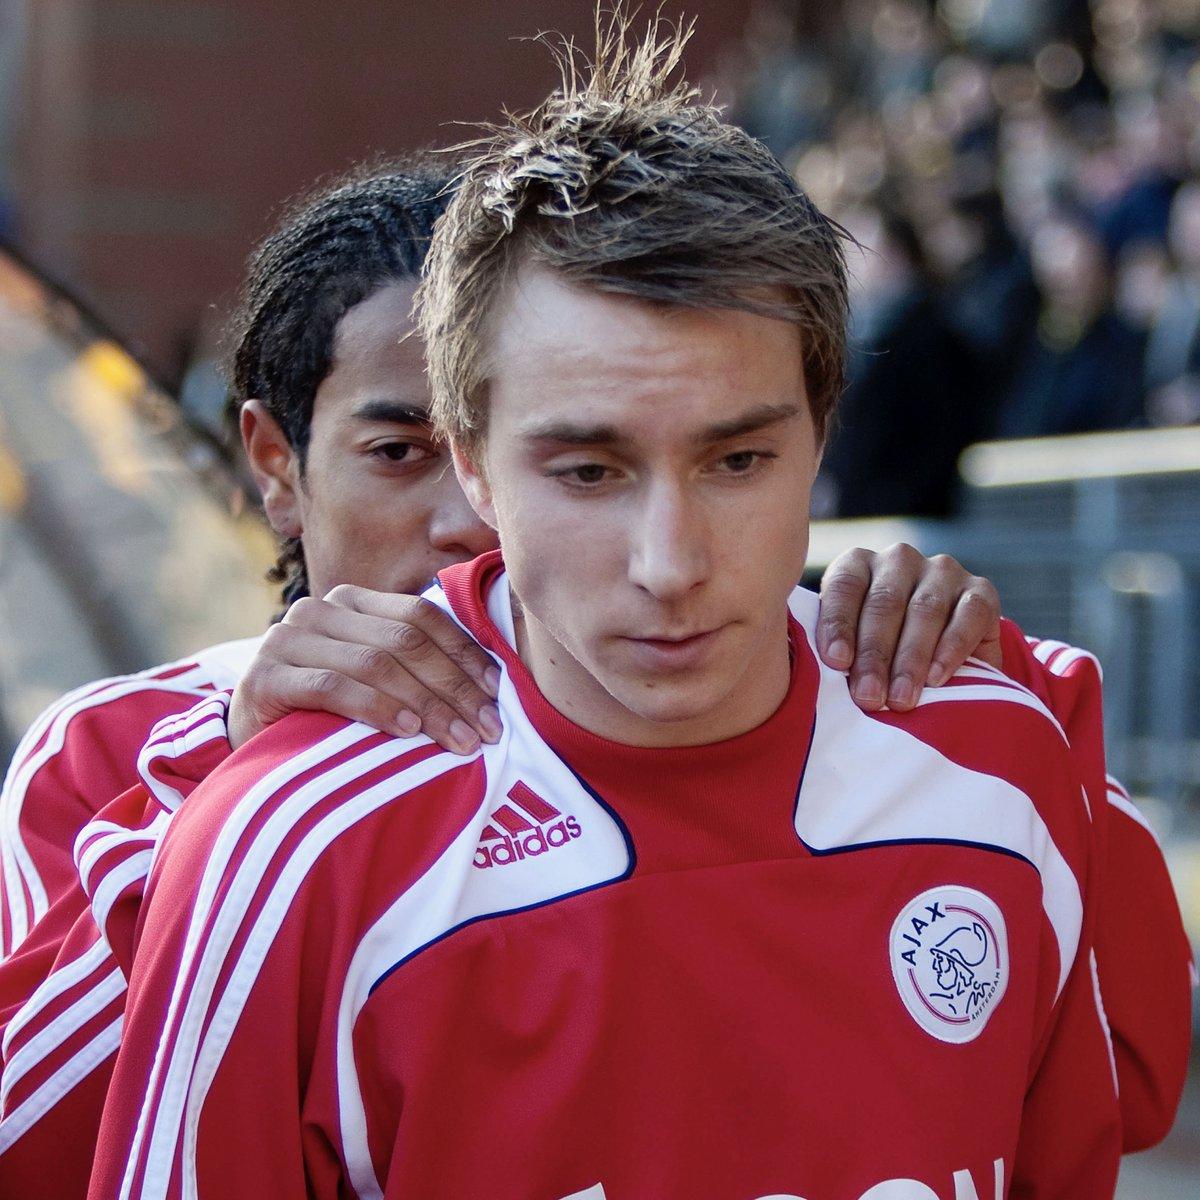 Today 10 years ago @ChrisEriksen8 made his debut... ⭐️ ☑️ NAC Breda vs Ajax ☑️ 17 years old ☑️ #ForTheFuture